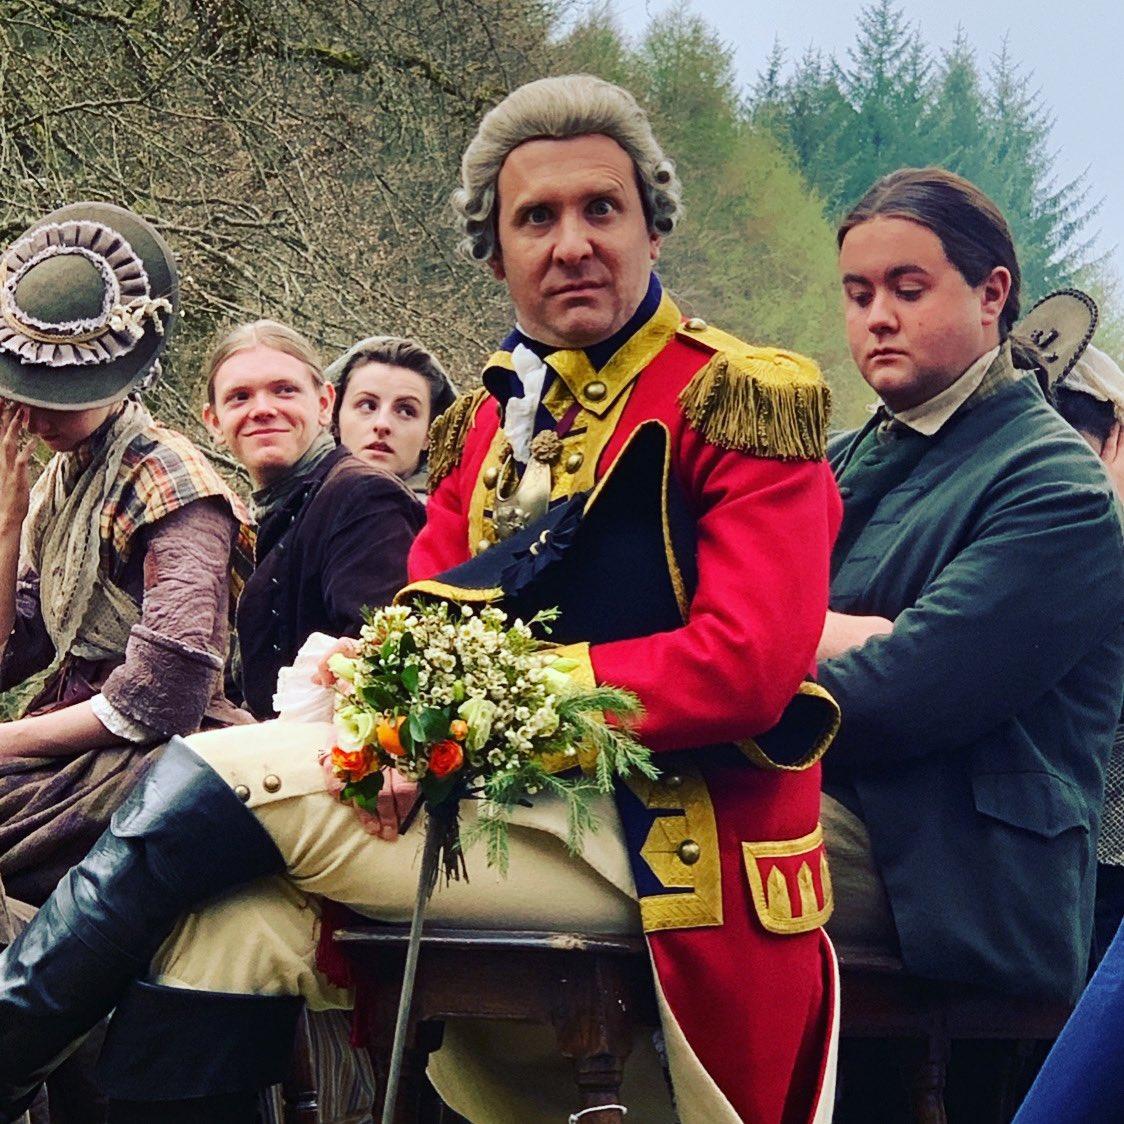 Governor Tryon, always the bridesmaid.  @TimDownie1 @Outlander_STARZ #outlander  #OutlanderS5 <br>http://pic.twitter.com/GWDYZnsalU